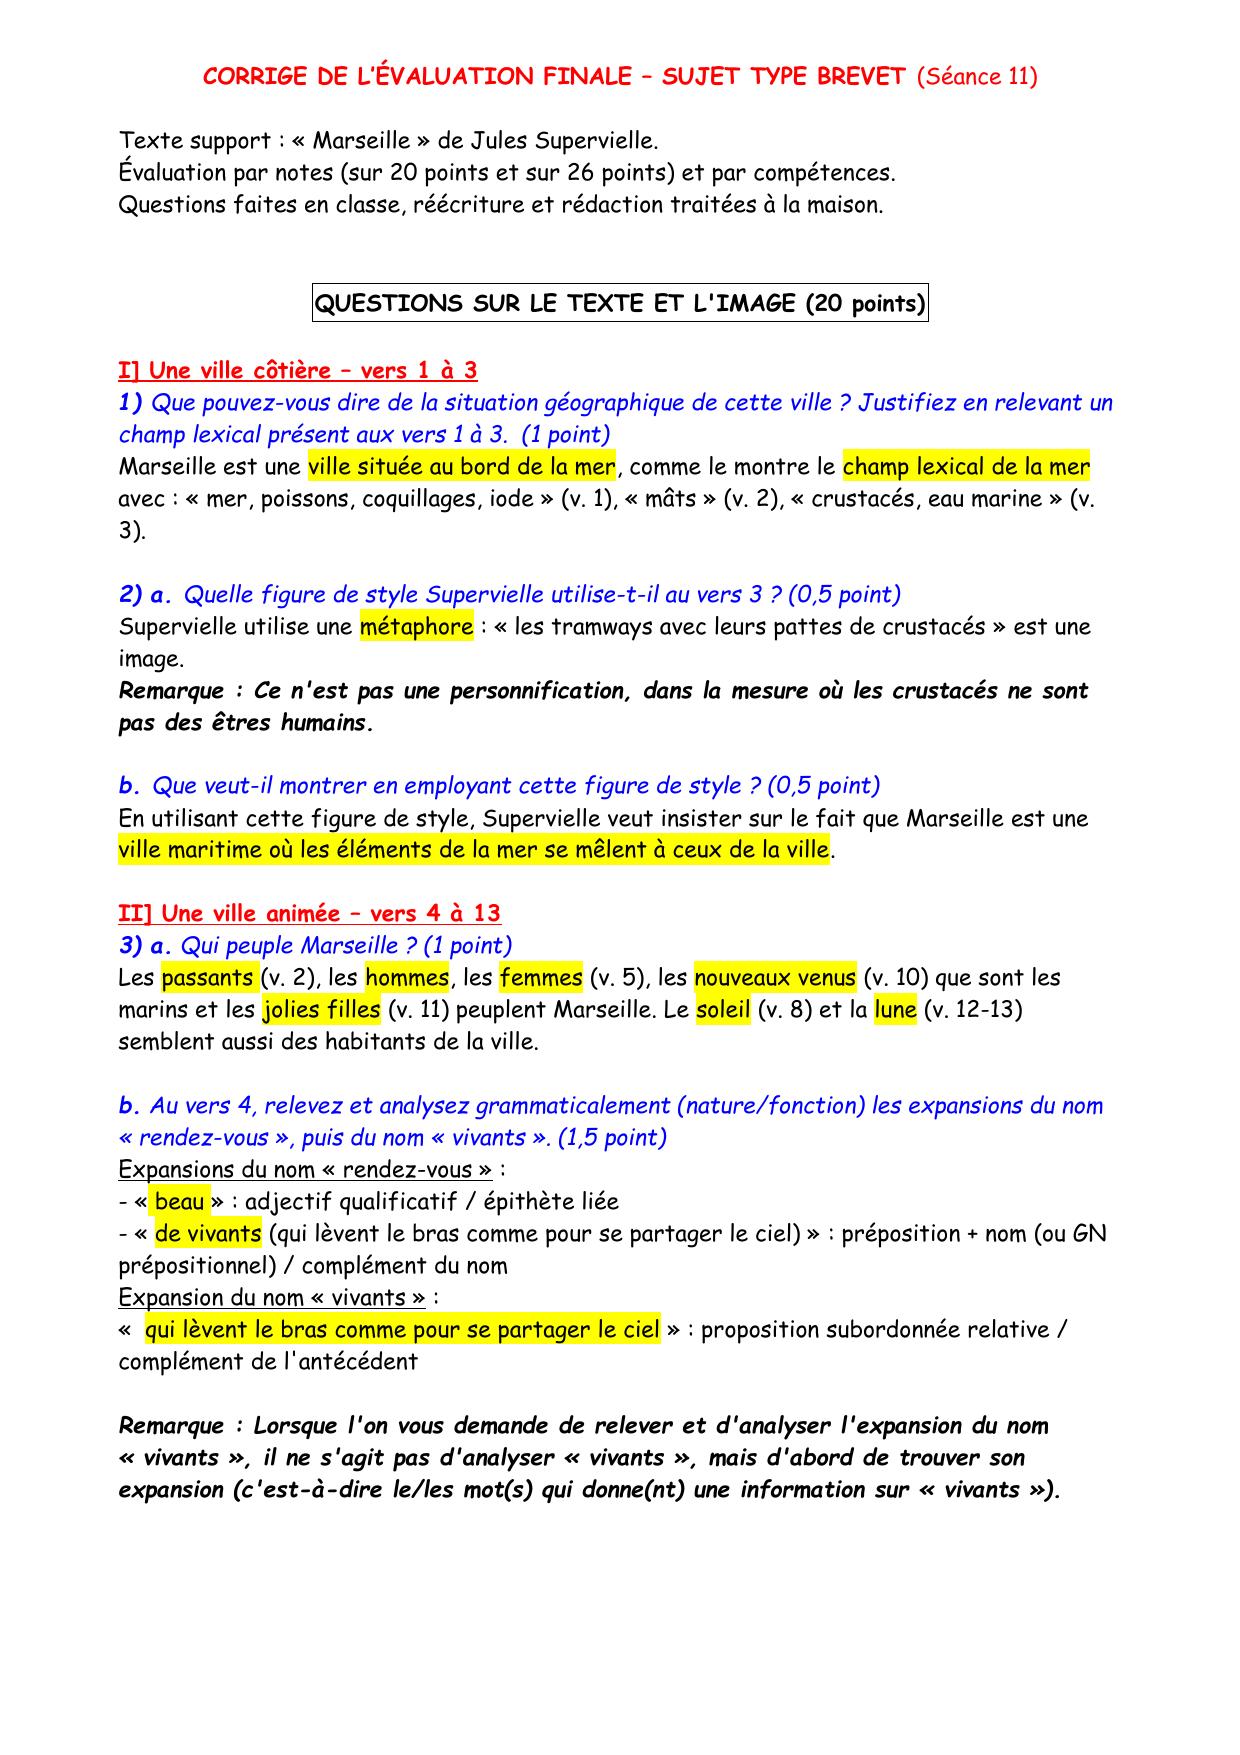 Dorable Reanudar Muestras De Doc Para Profesores Festooning ...